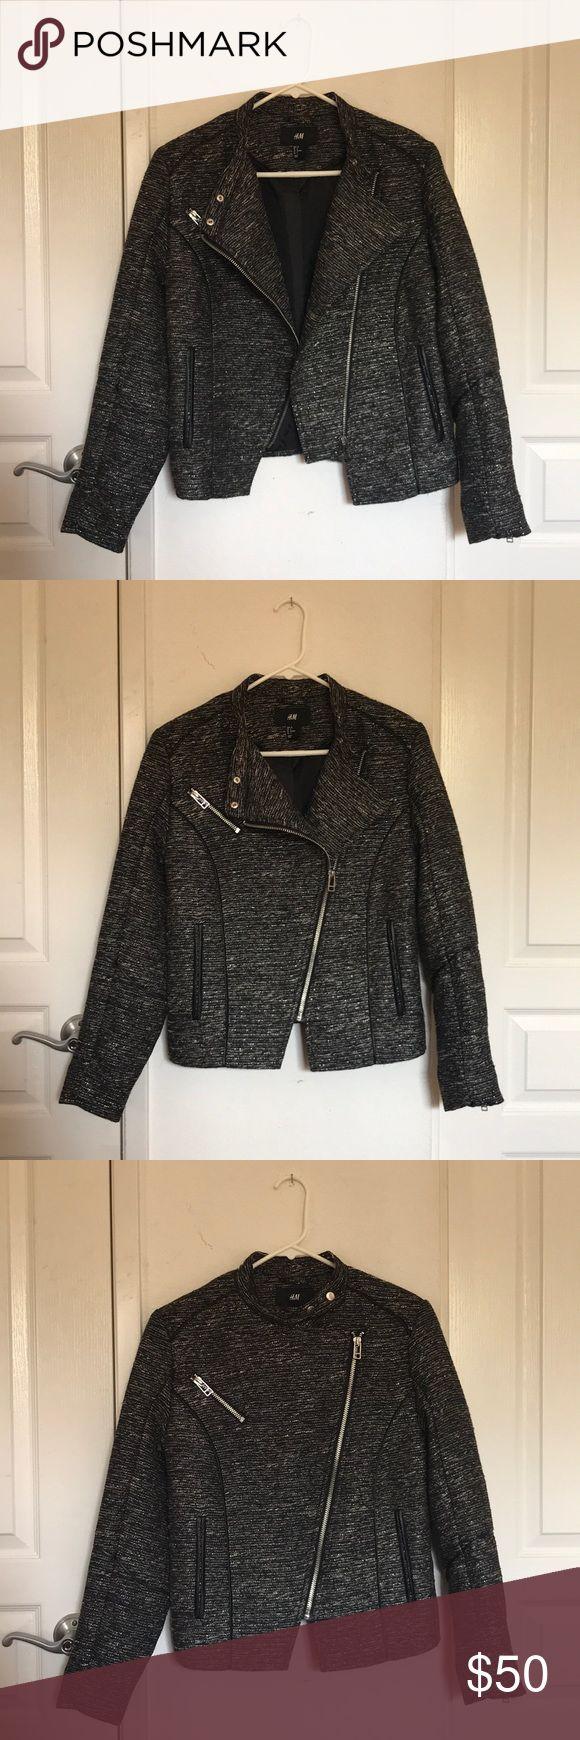 H&M Bomber Jacket Bomber jacket, Jackets, Clothes design